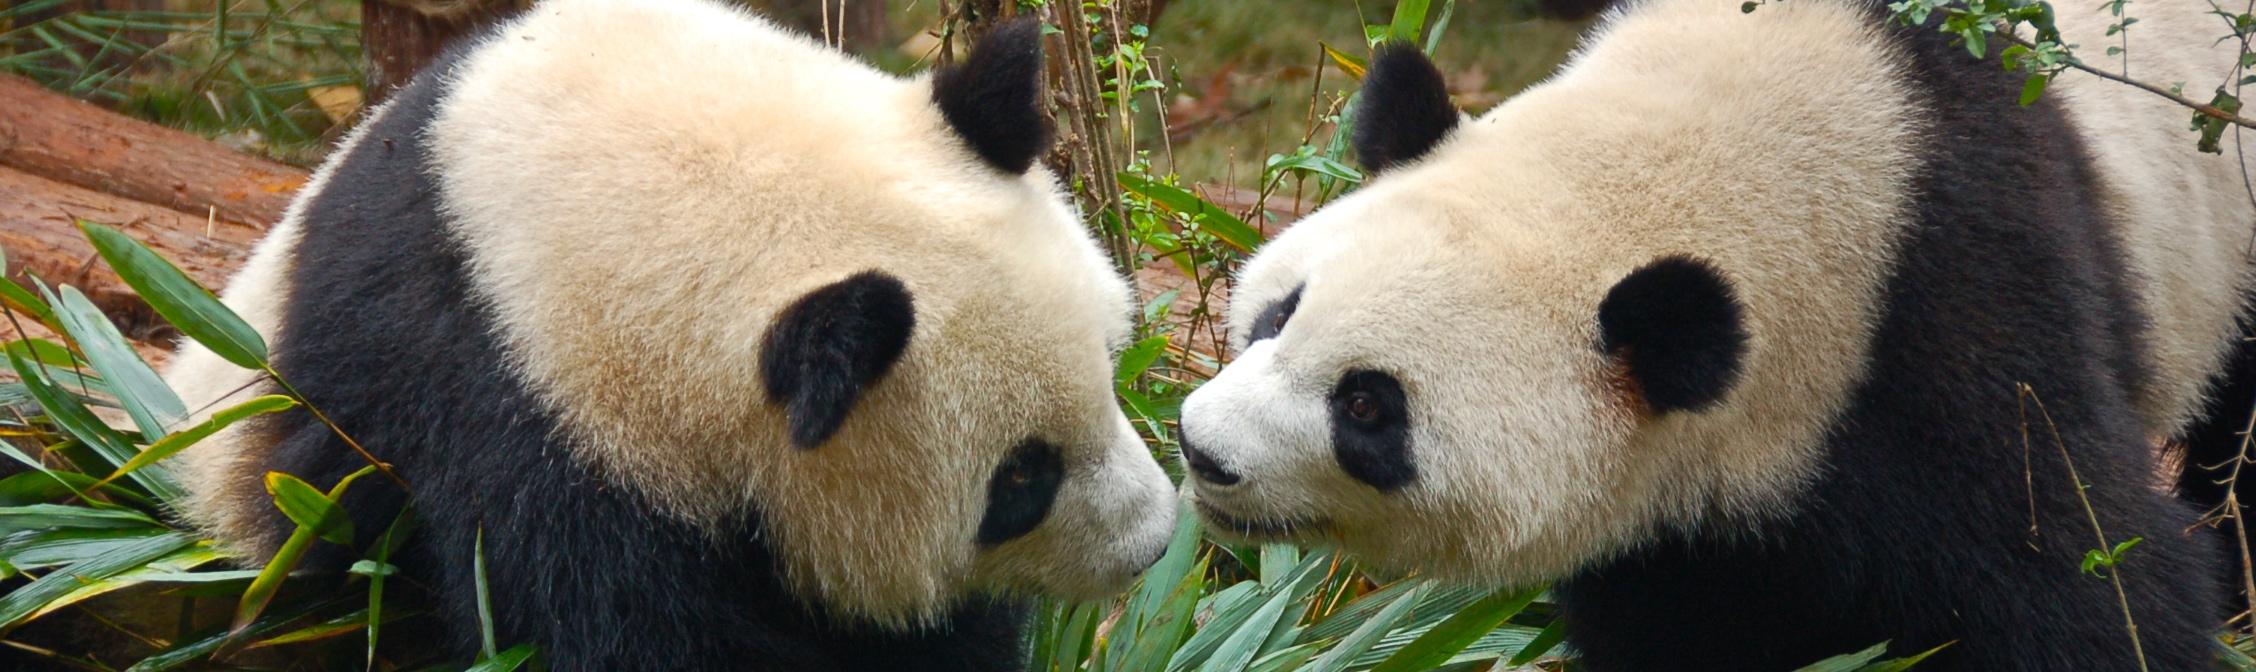 Oso panda Chengdu